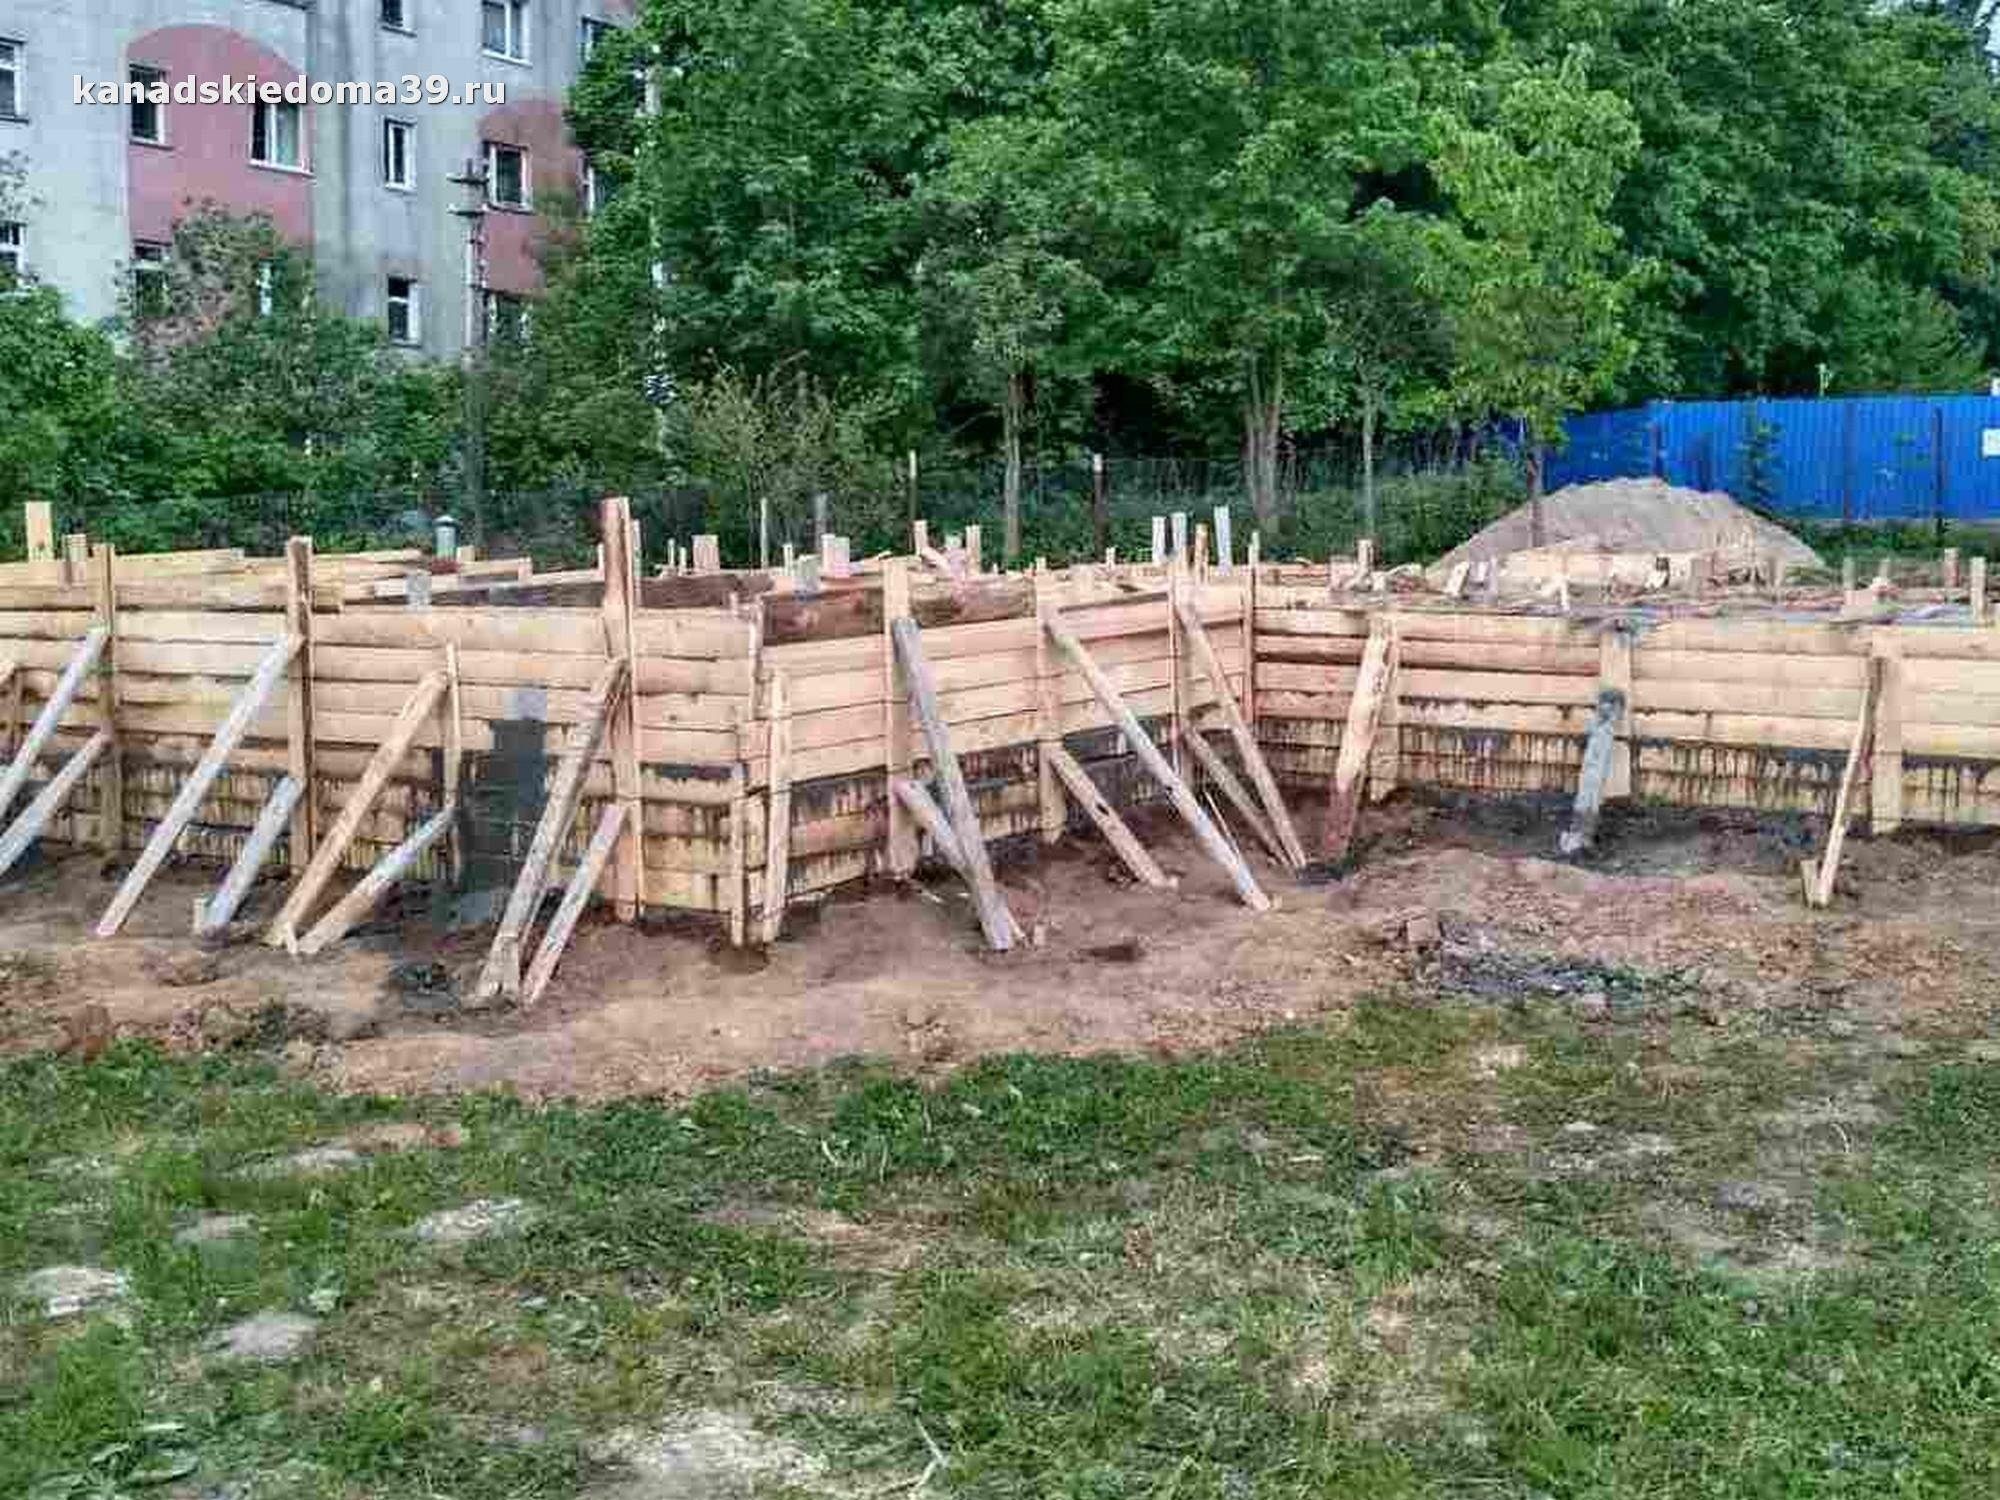 kd-sip-dom-baltiysk00092